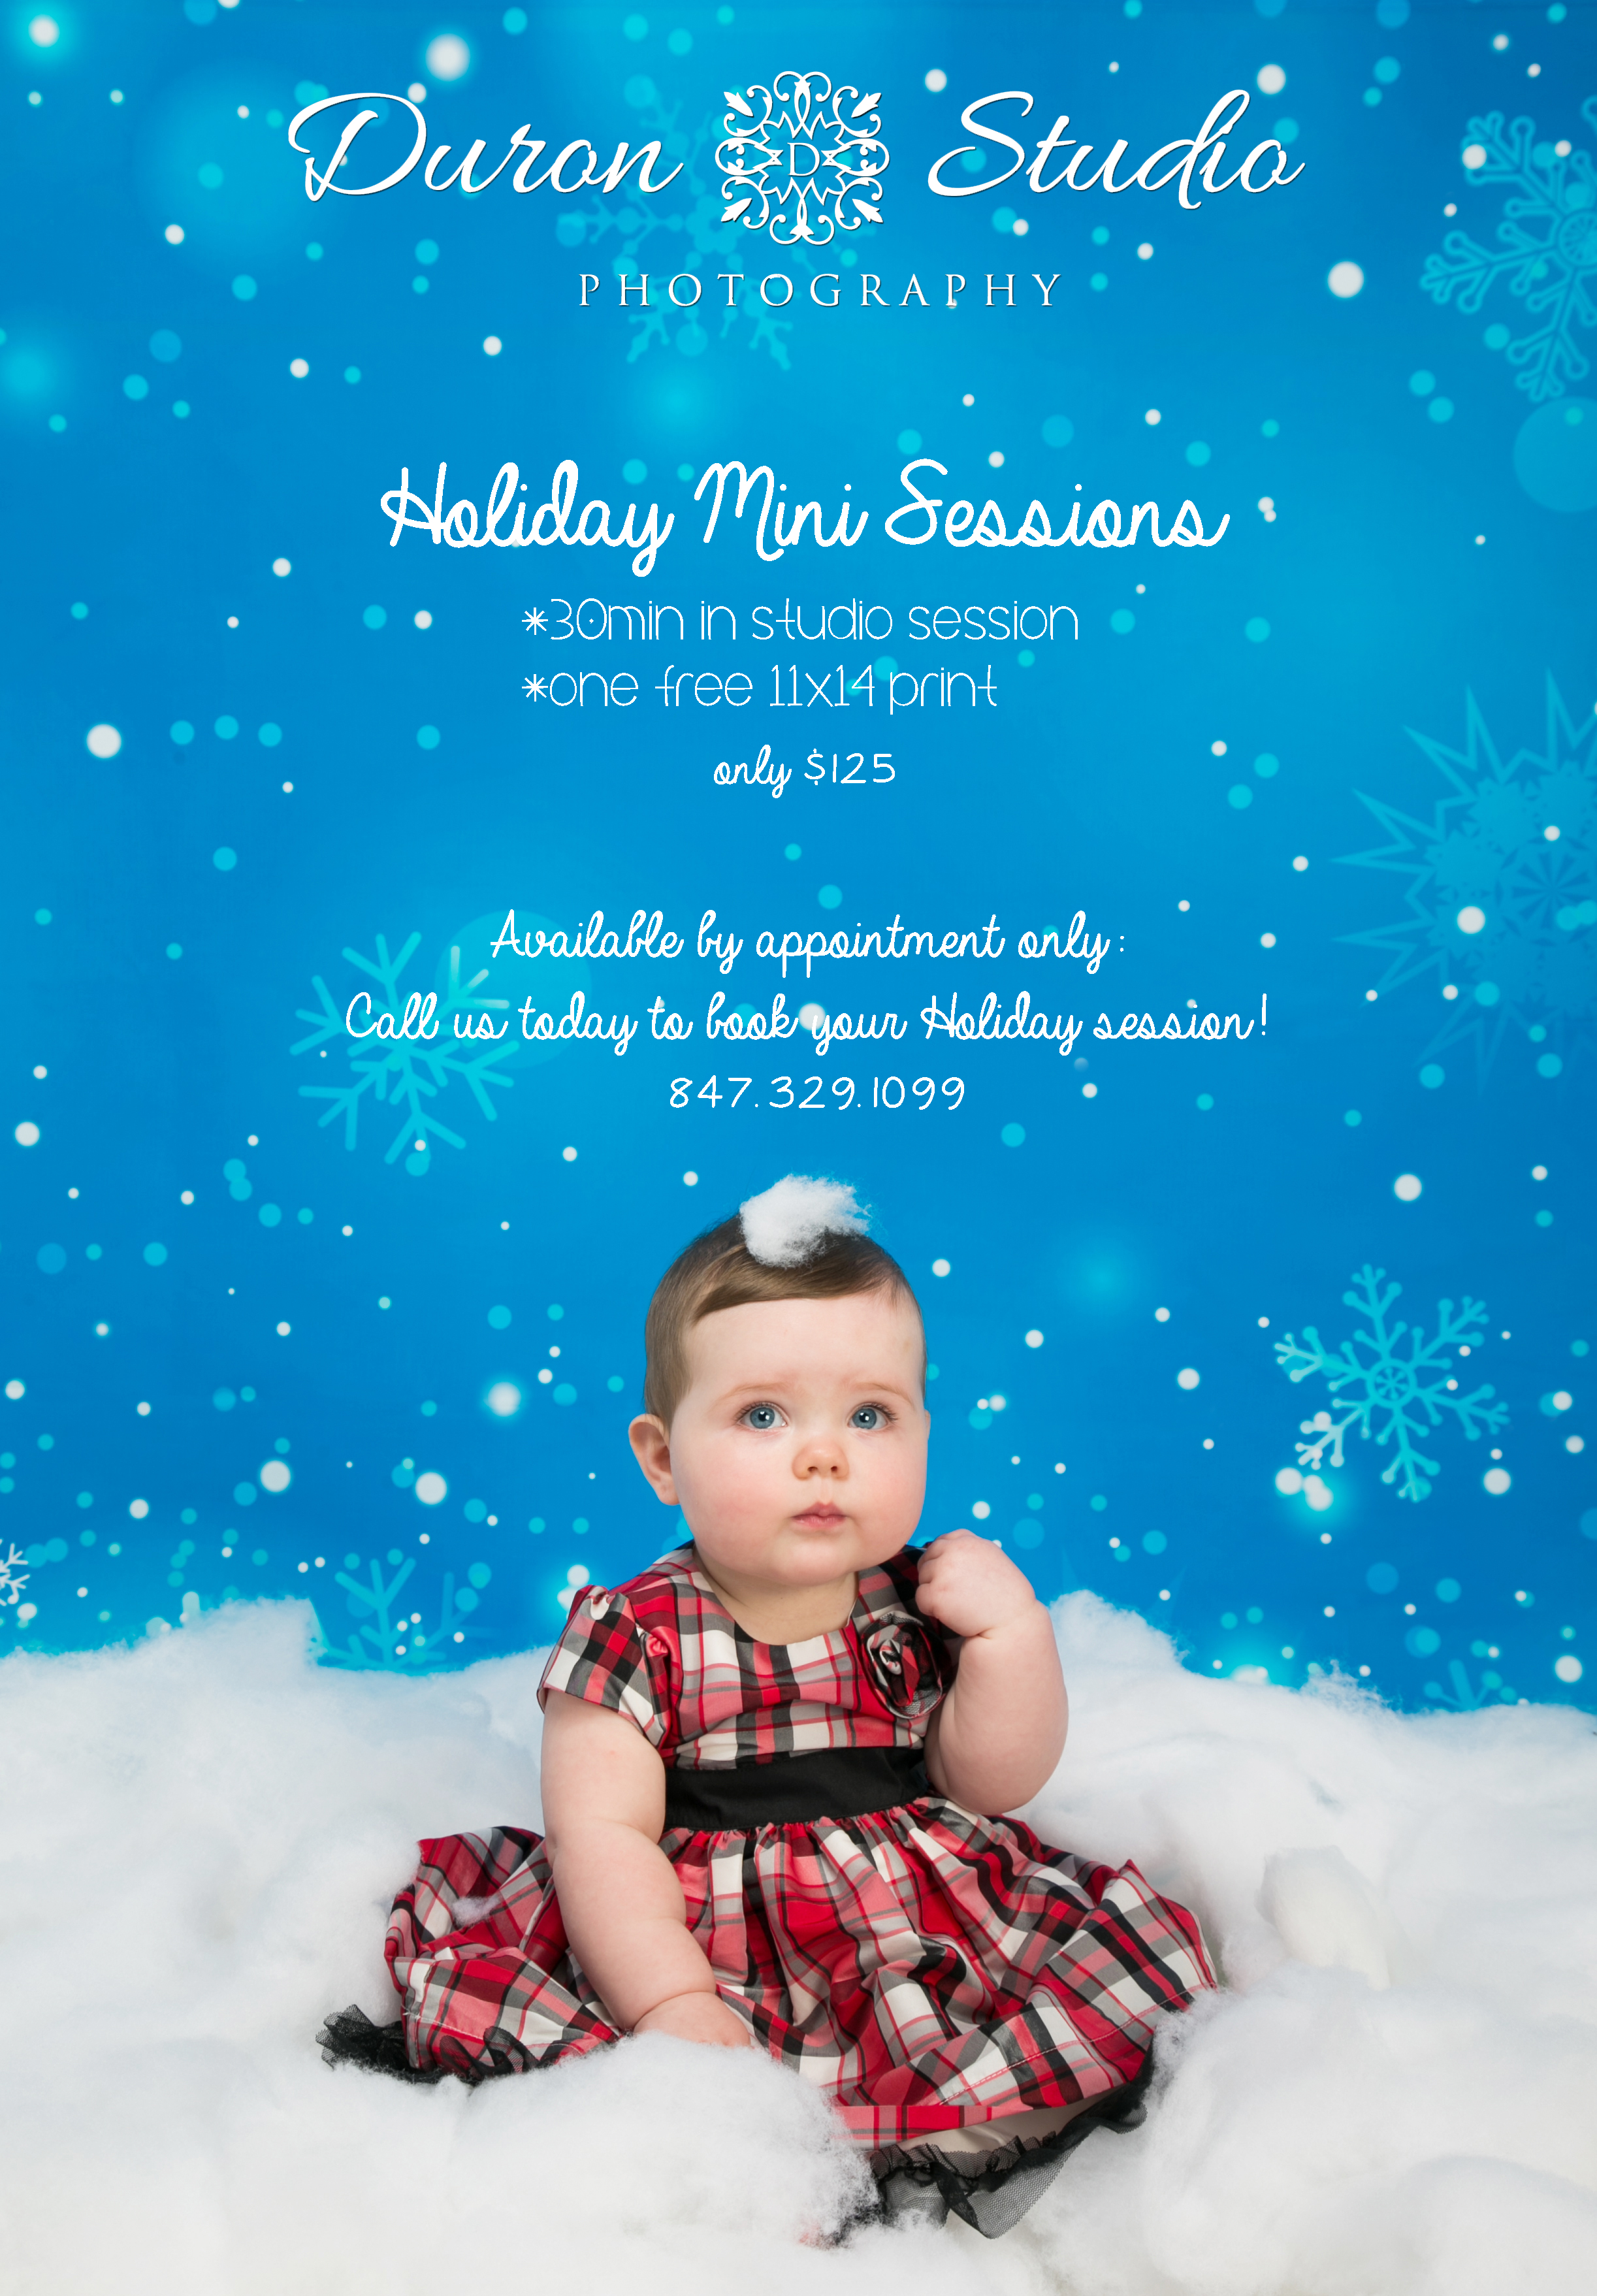 2018 Holiday Session Promo.jpg